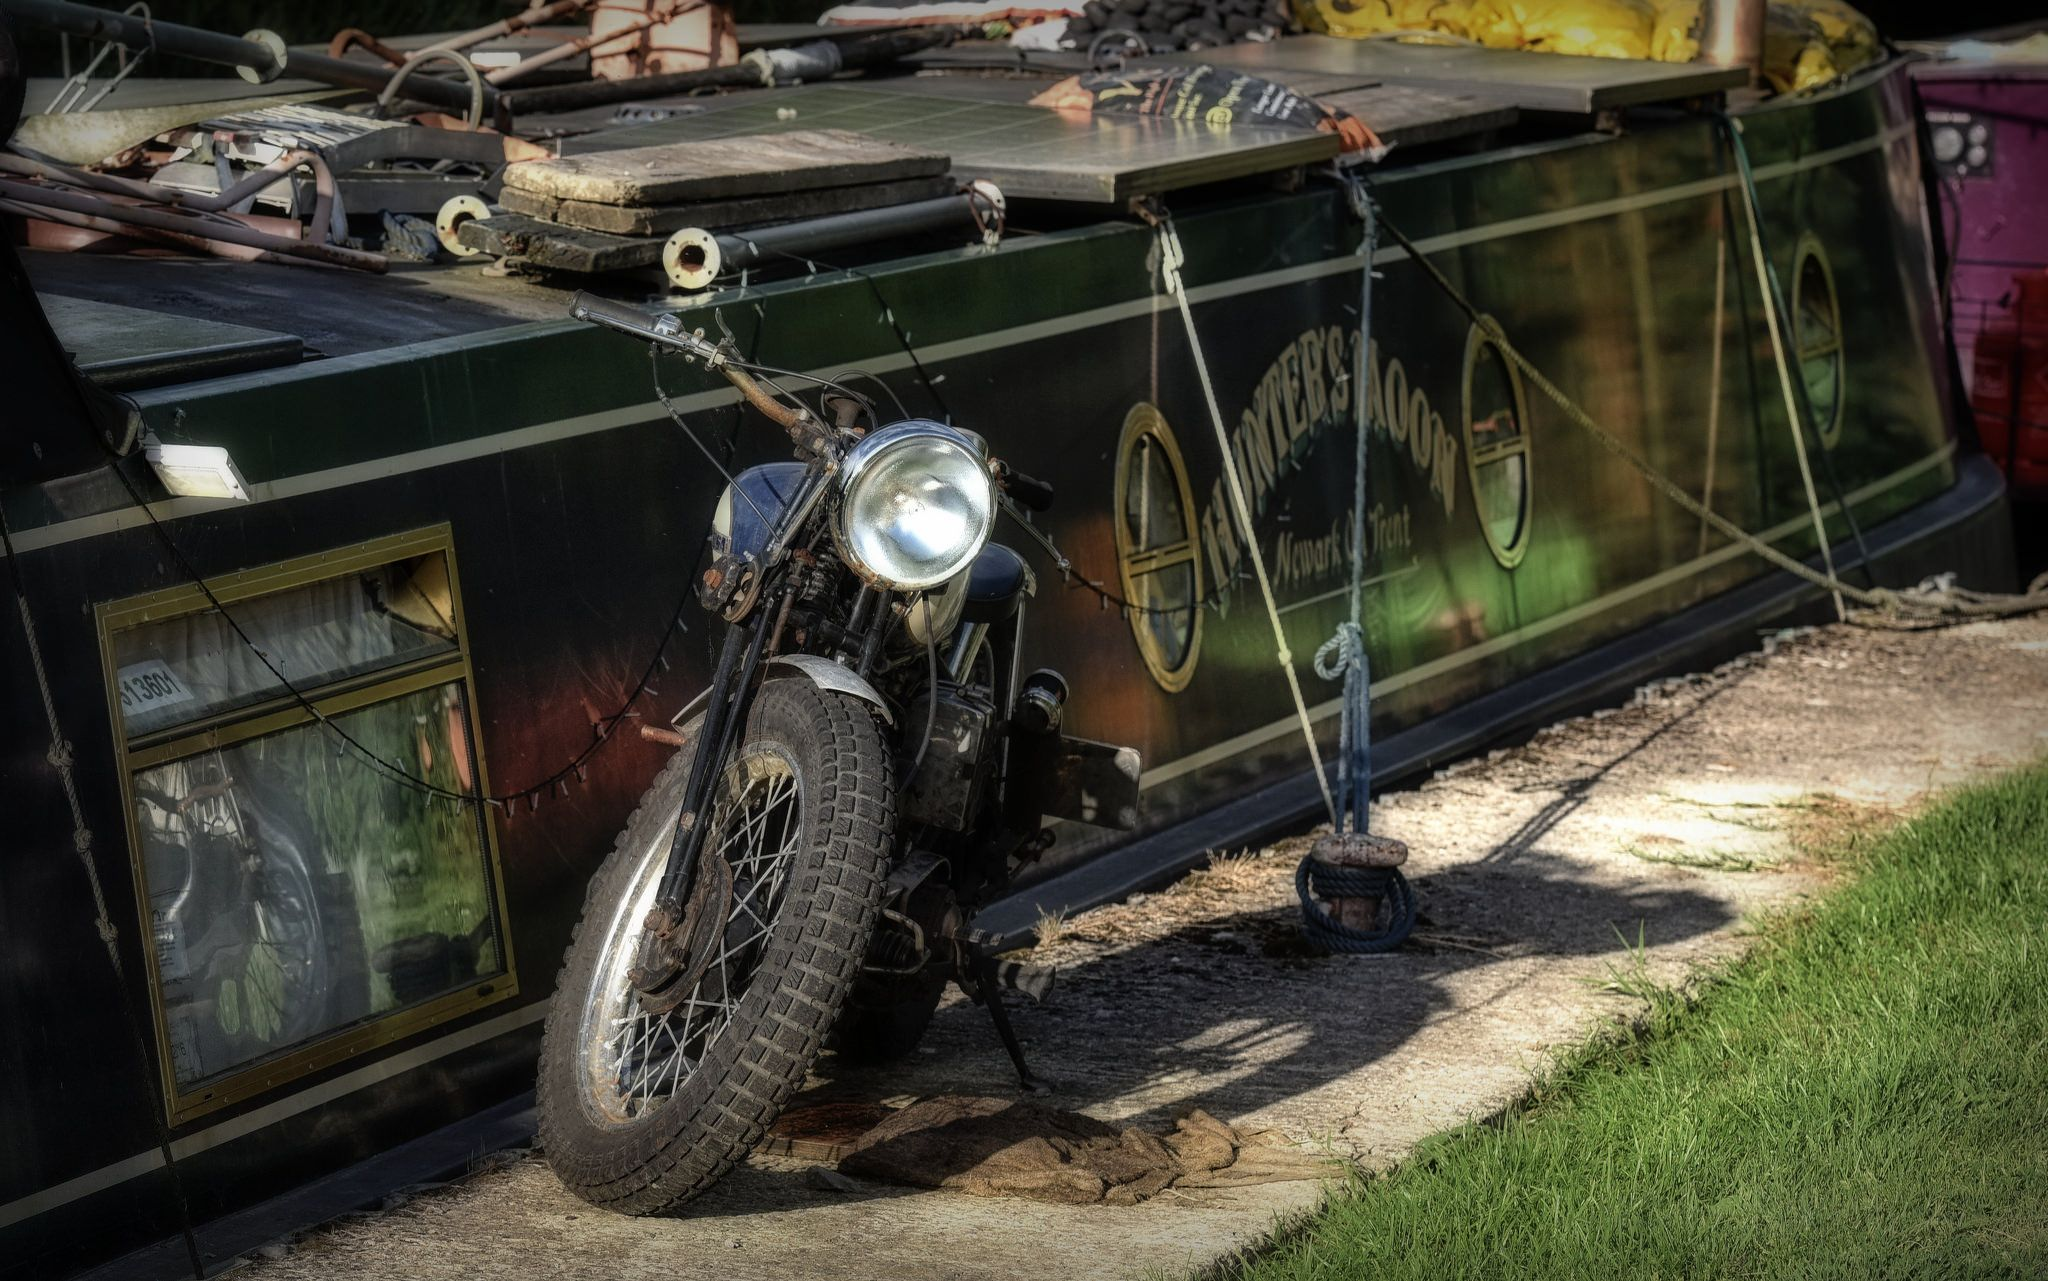 https://flic.kr/p/K7tL6n | Bobber & Barge... | Bobber & Barge.. Kennett & Avon Canal, Wiltshire.